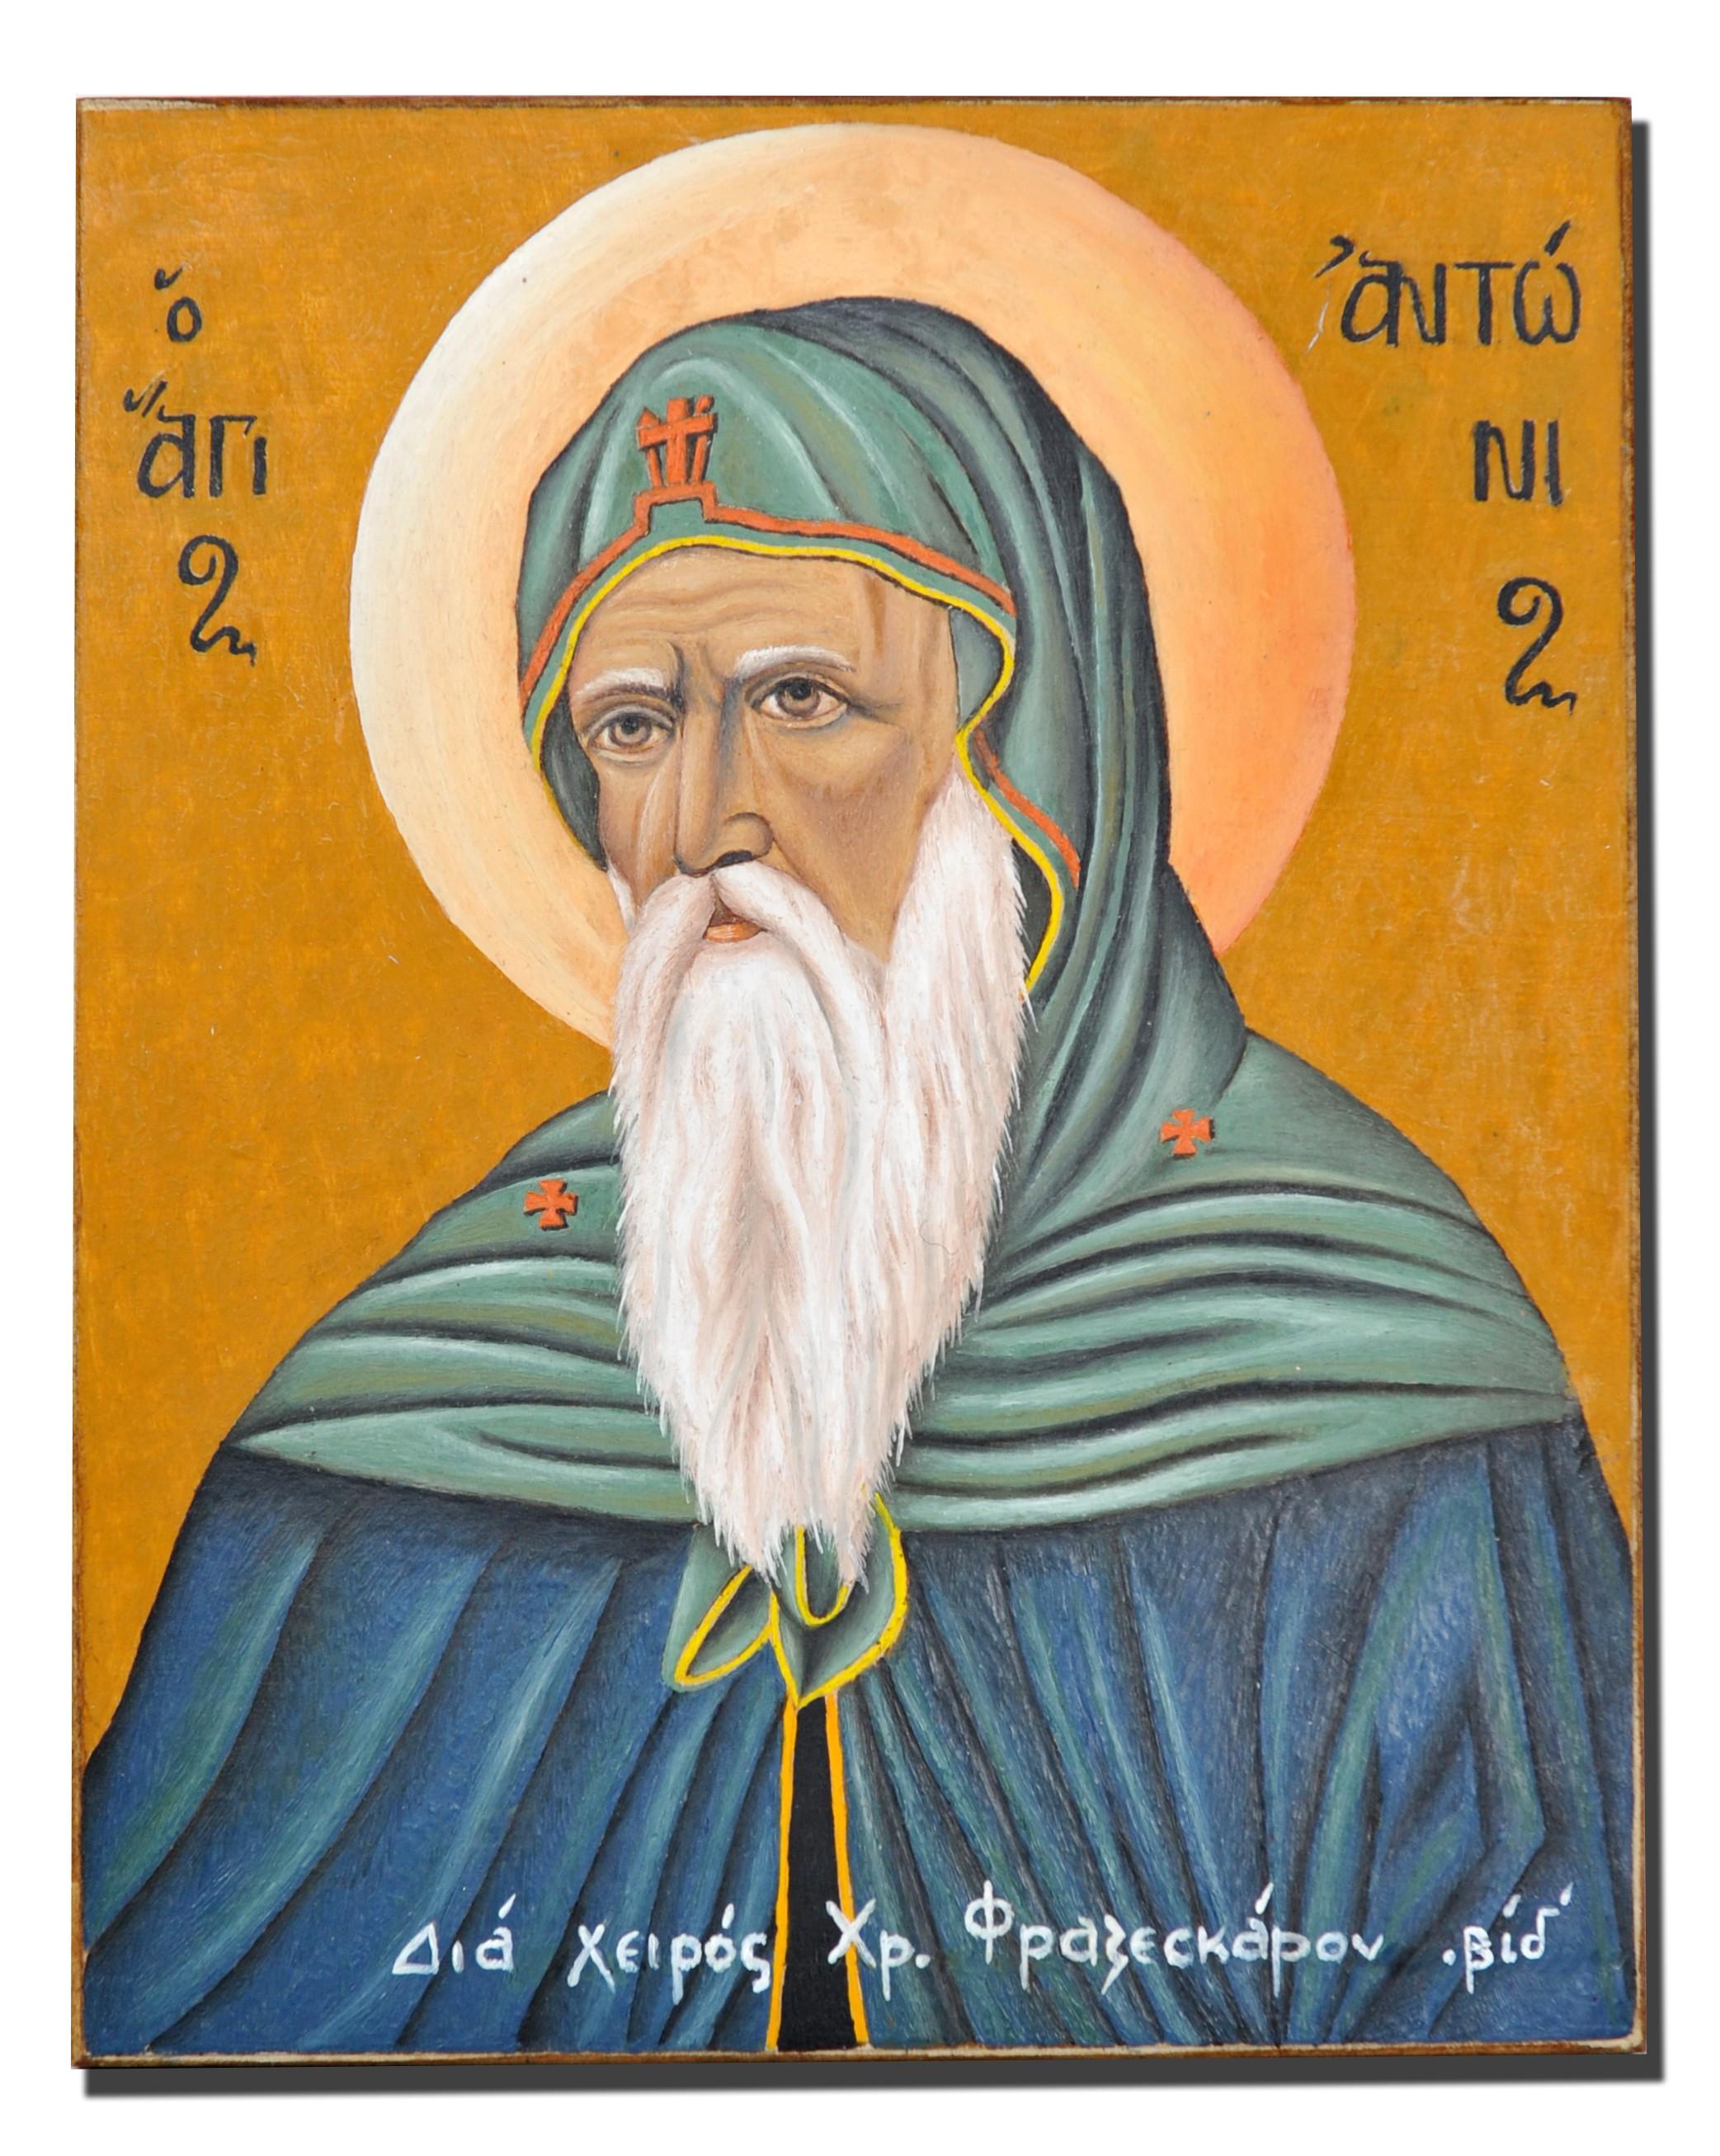 St Antonios